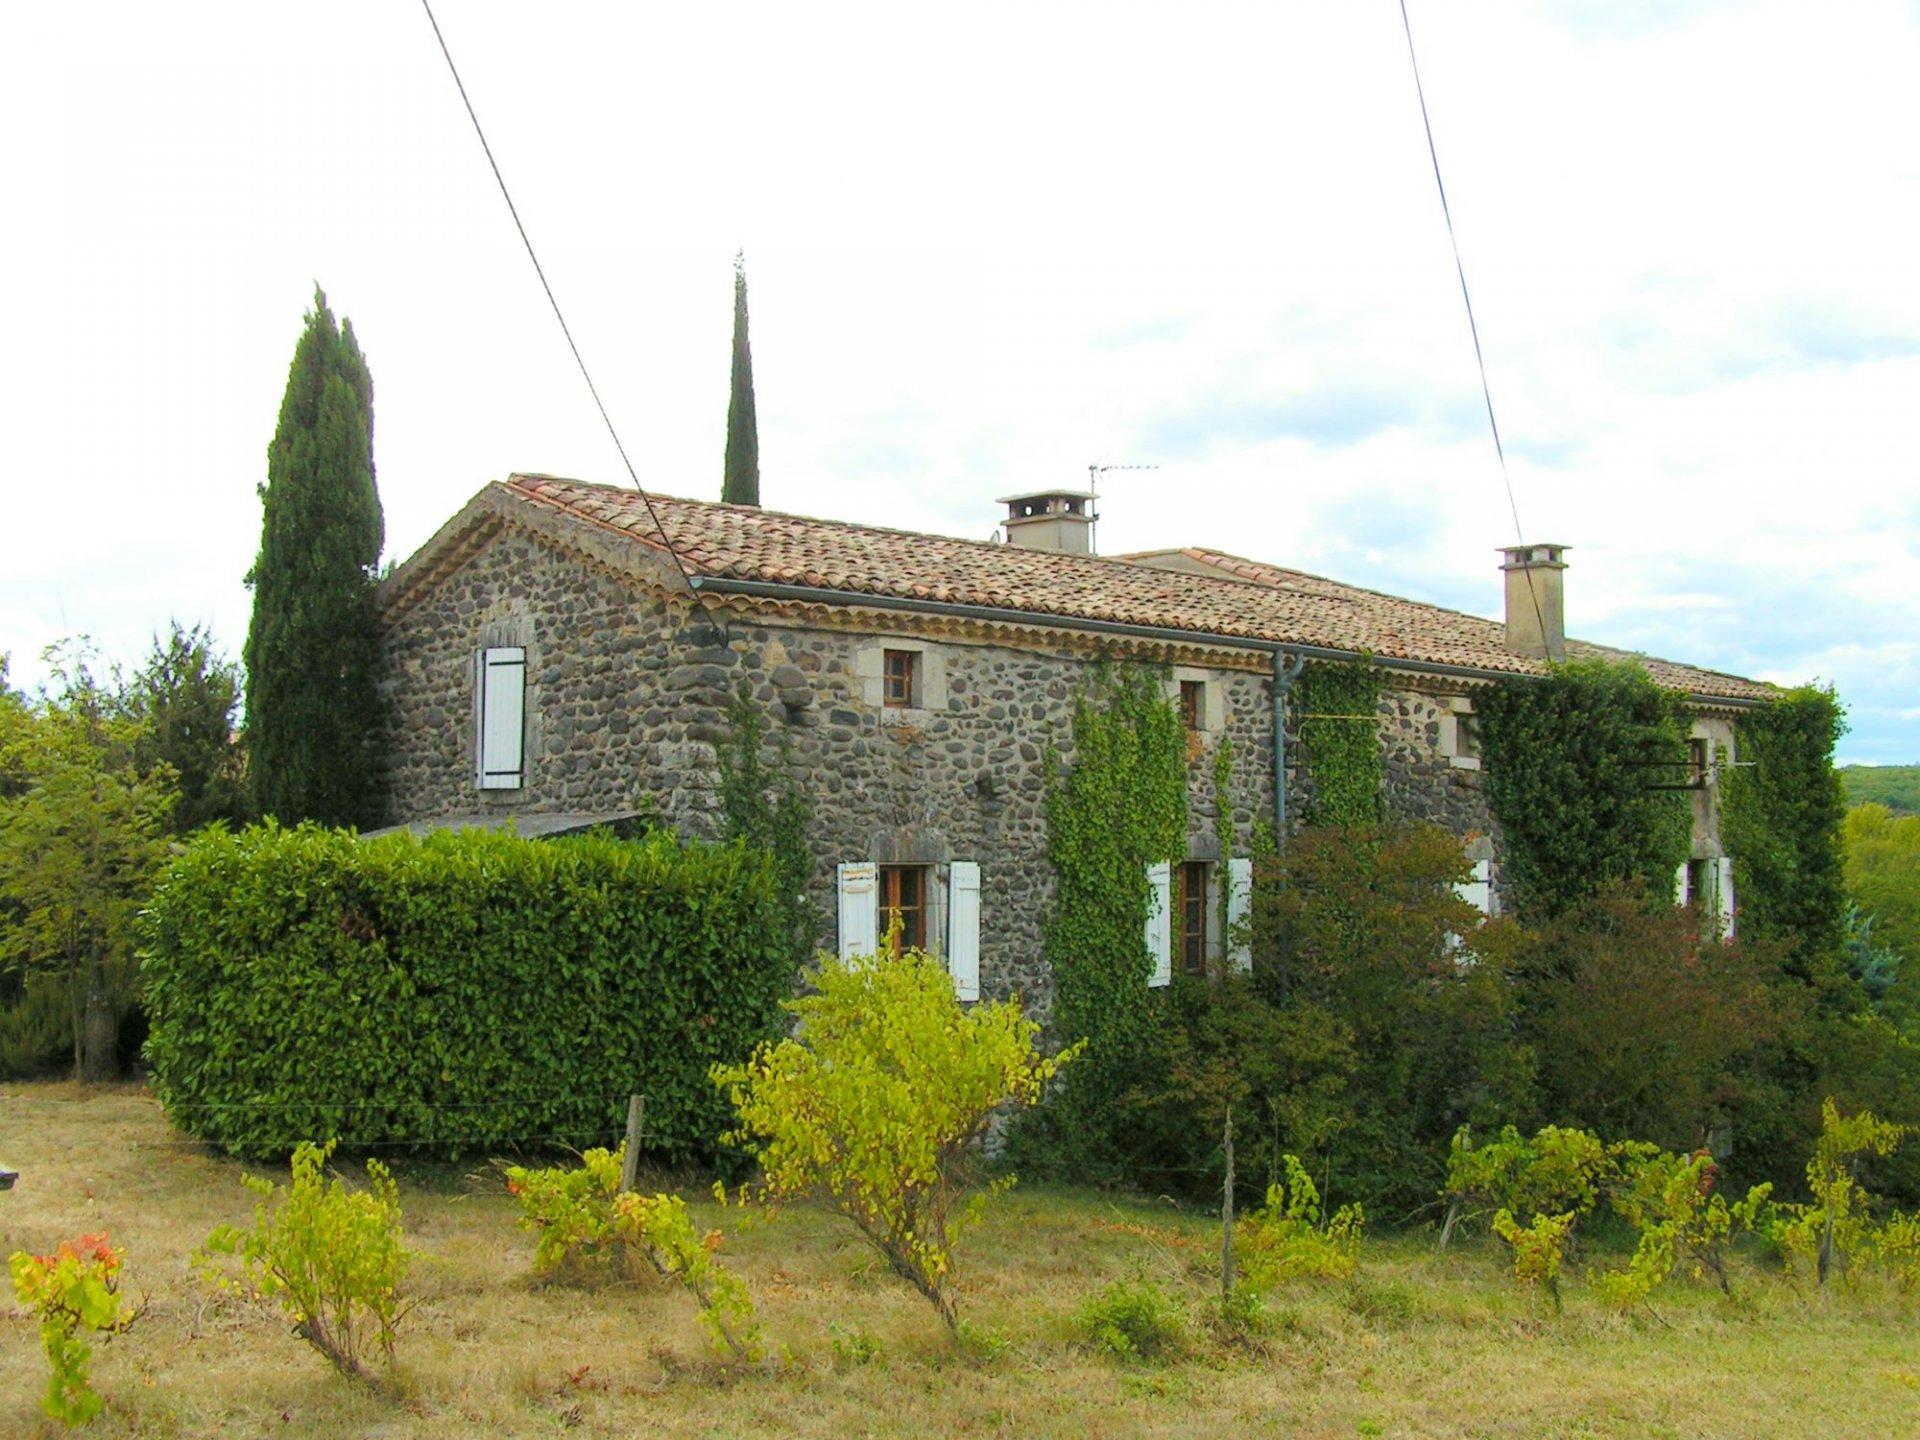 Landhuis /chambres d'hôtes, Mirabel, zuid-Ardèche